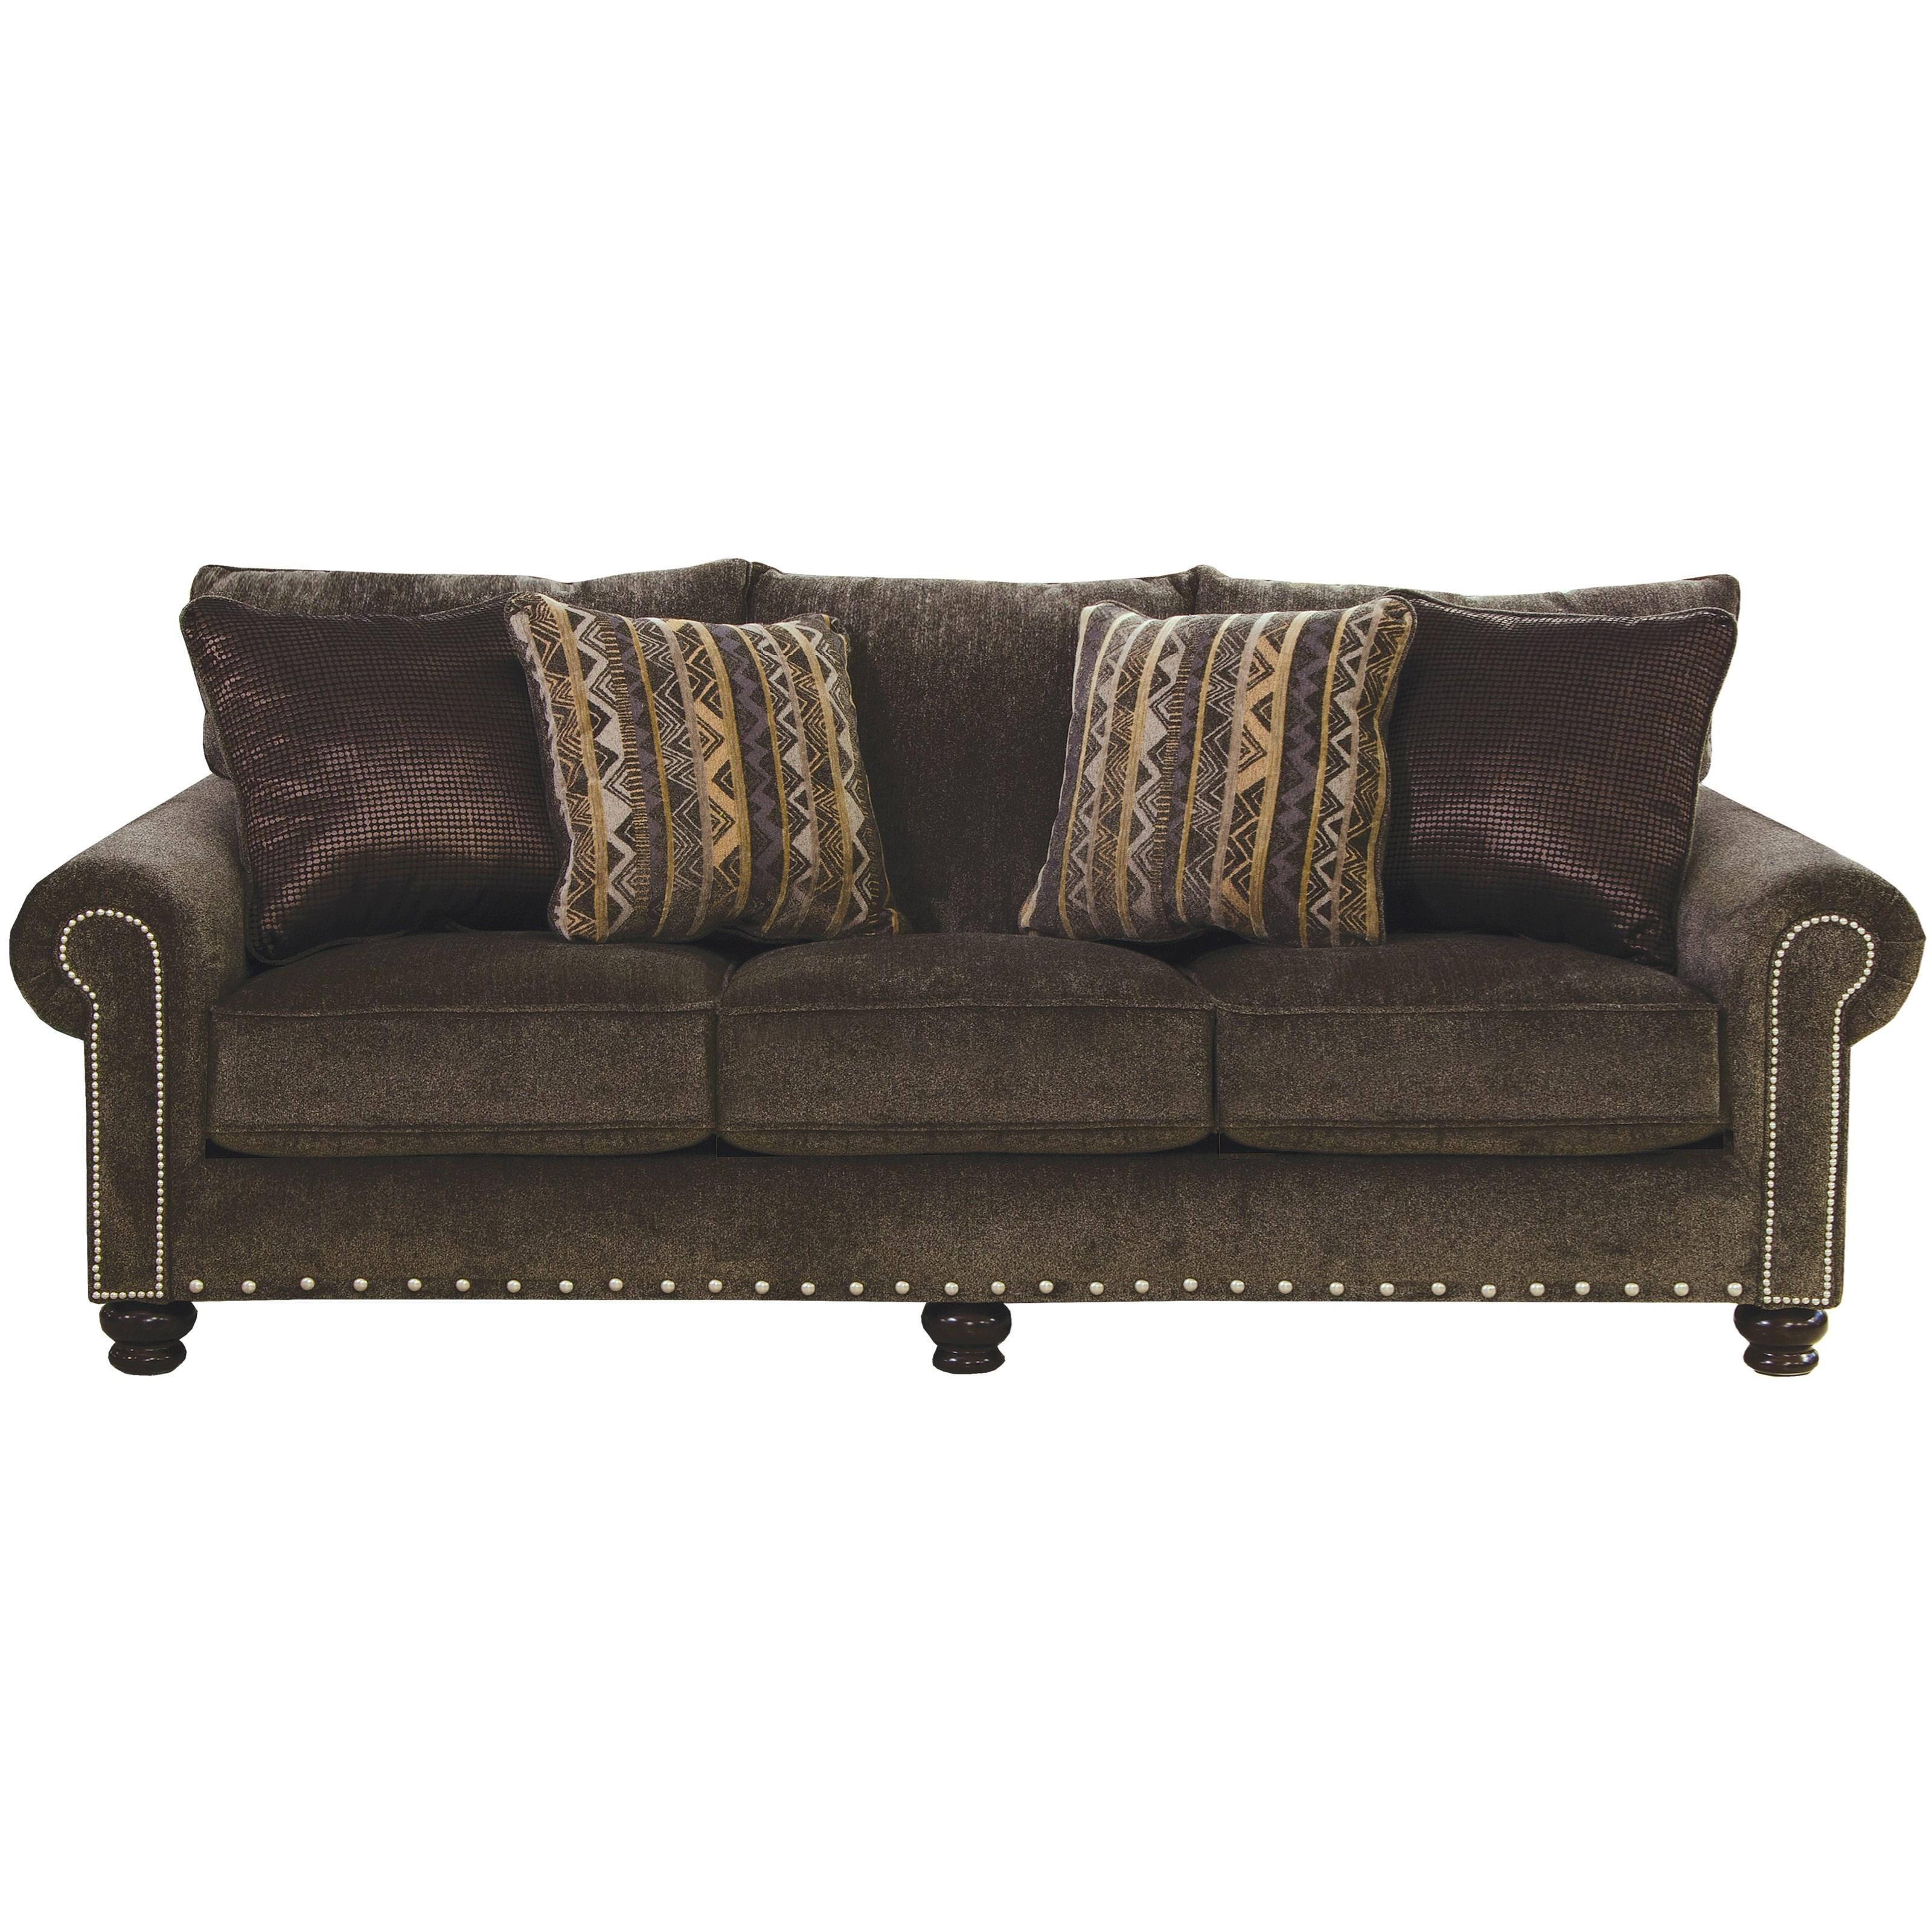 Jackson Furniture Avery Sofa A1 Furniture Amp Mattress Sofas